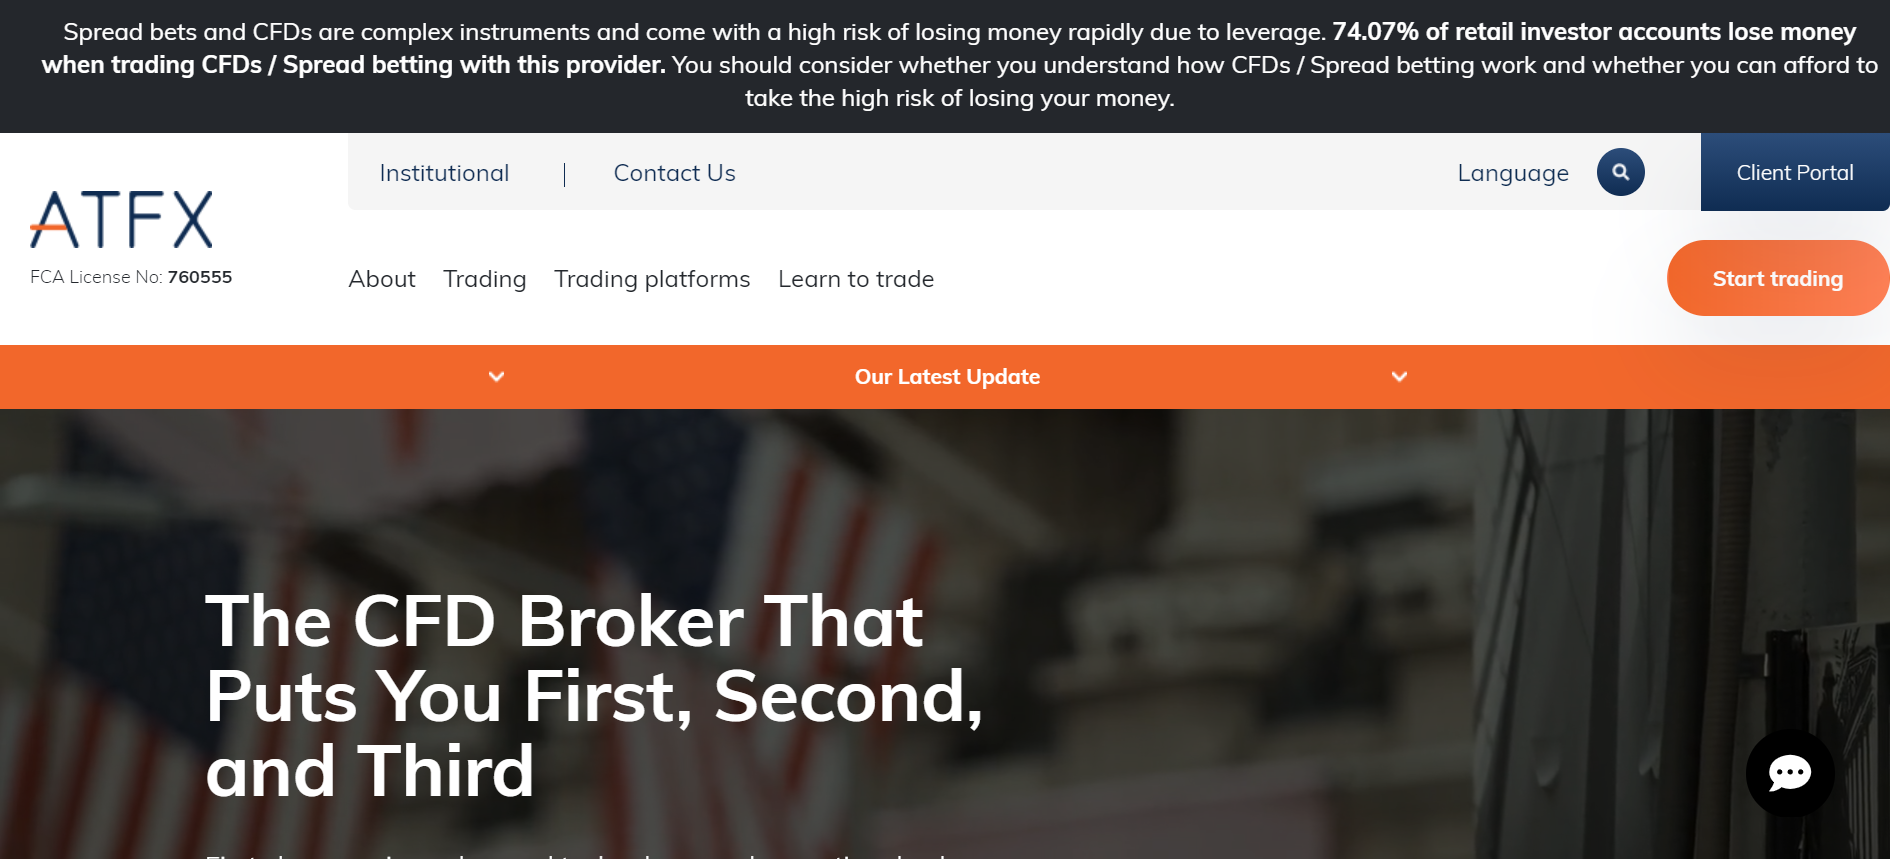 AT Global Markets (UK) Limited web